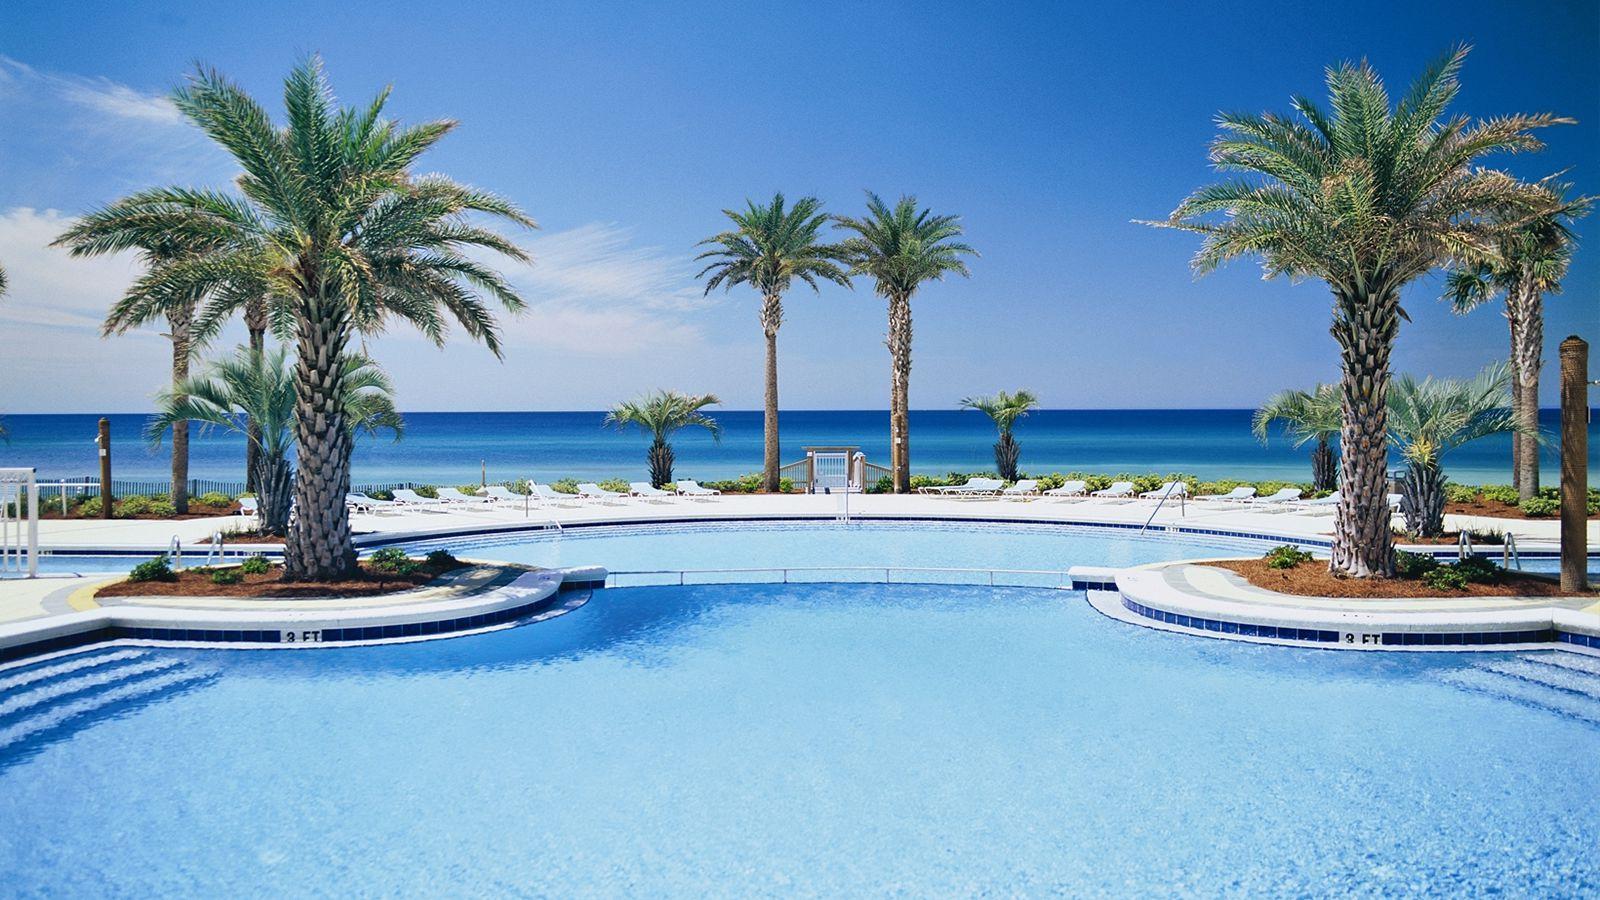 Panama City Beach Real Estate Miller Ociates Your Broker